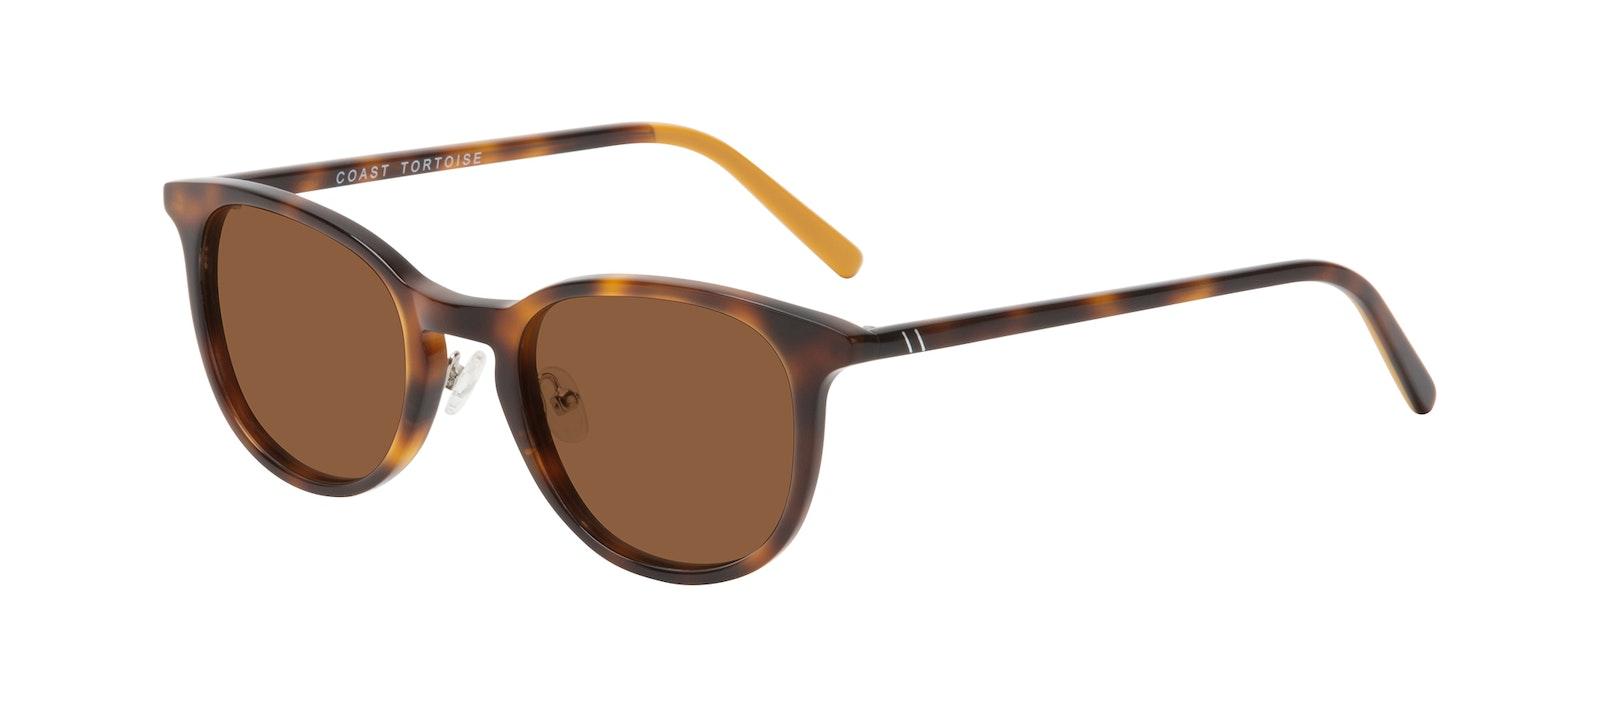 Affordable Fashion Glasses Round Sunglasses Men Coast Tortoise Tilt